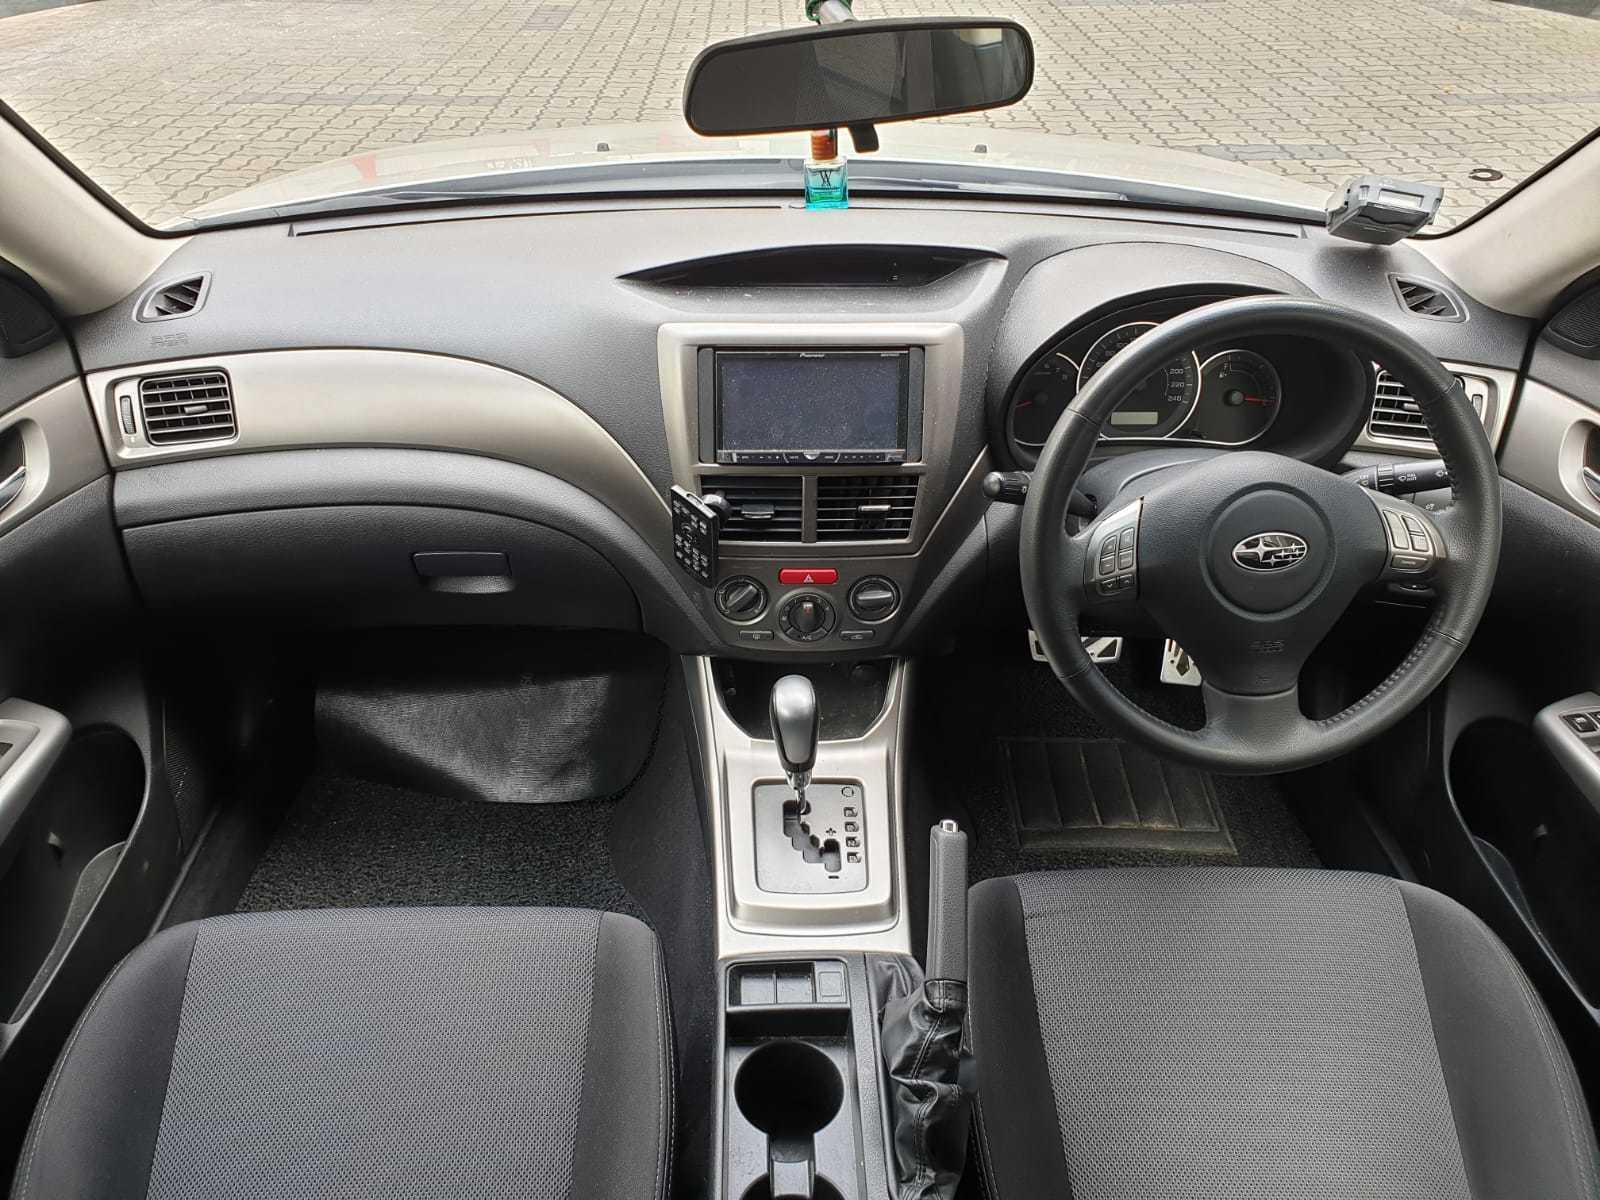 Subaru Impreza 2.0A @ Lowest rental rates, good condition!